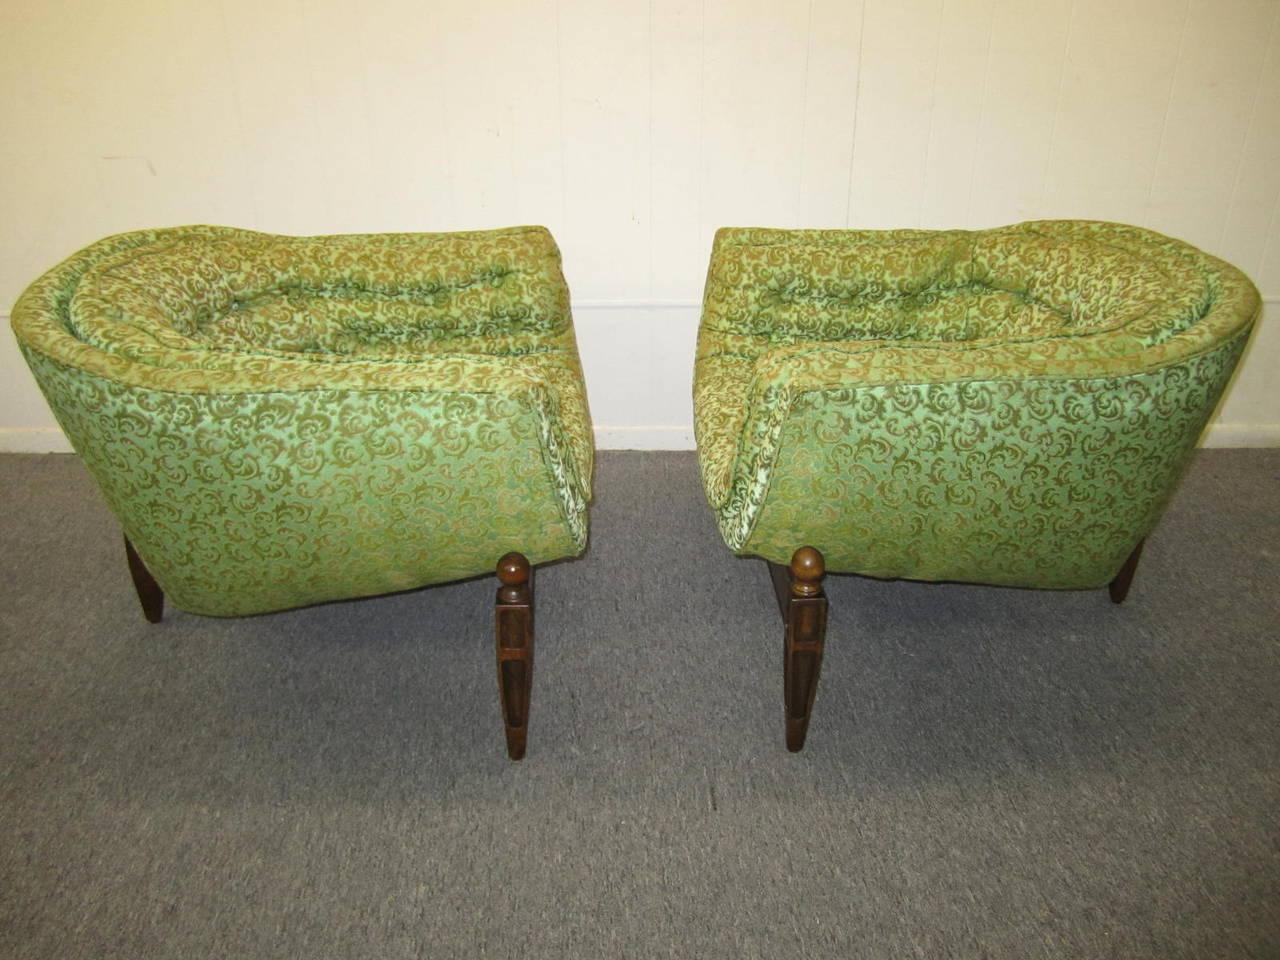 Lovely Pair Of Mid Century Modern Tufted 3 Legged Lounge